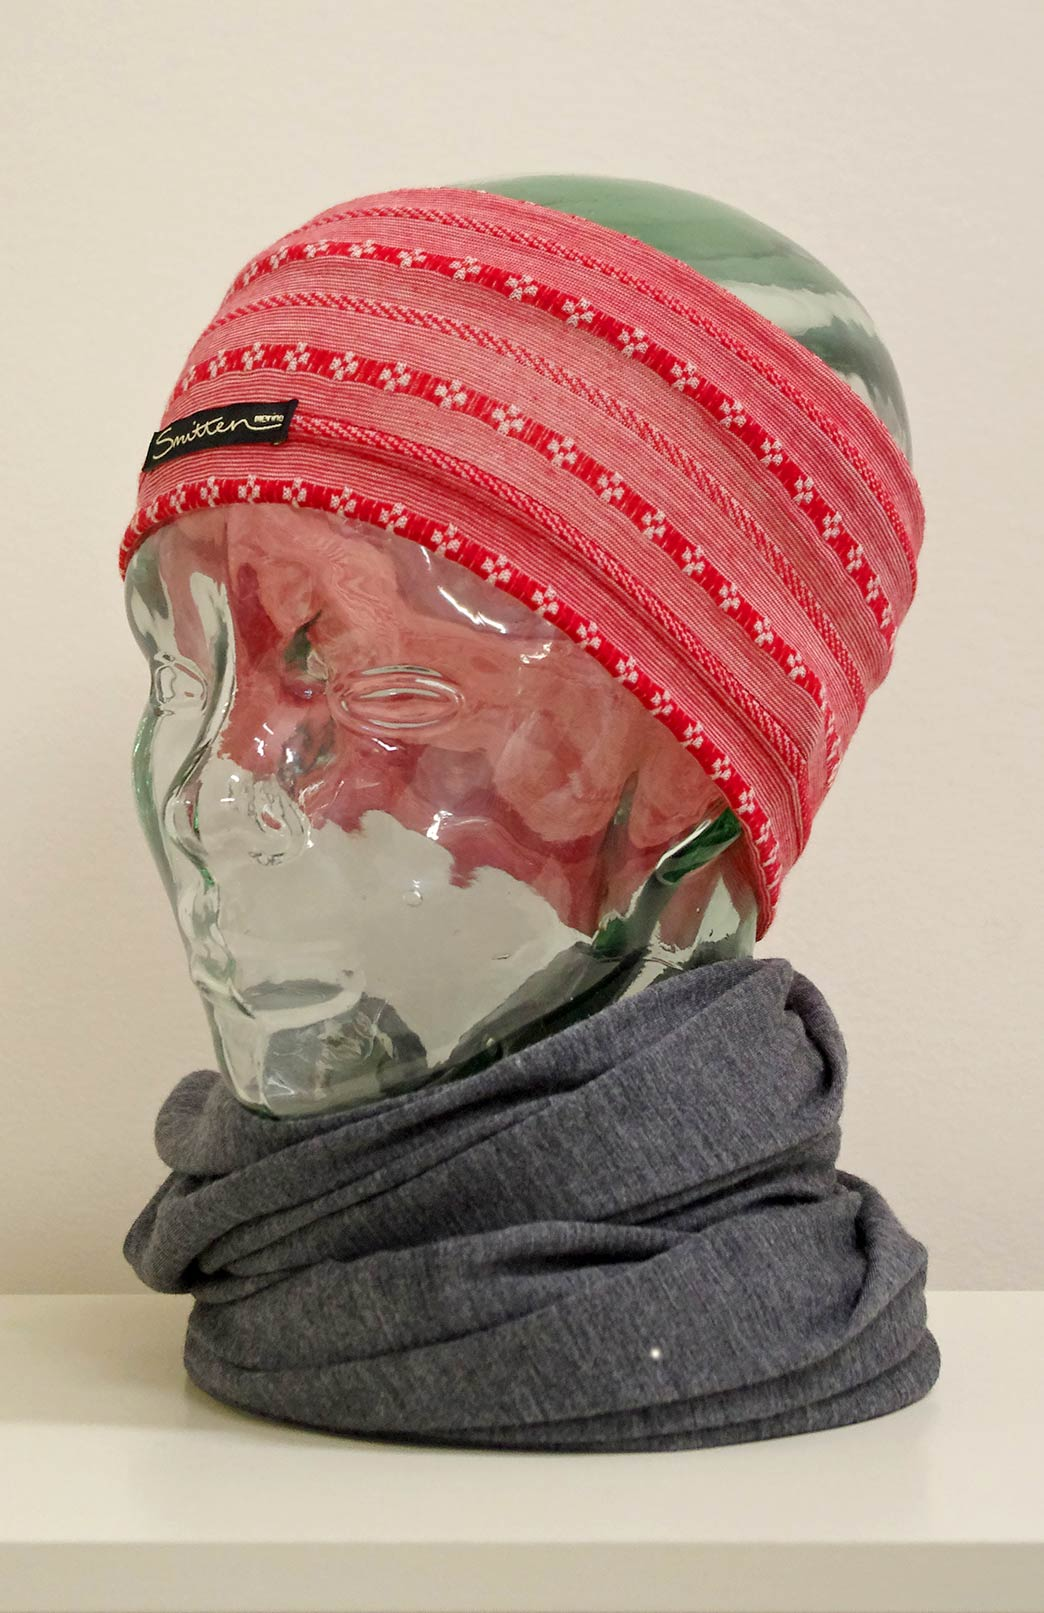 Headband / Ear Warmer - Unisex Red Pixie Merino Wool Headband and Ear Warmer - Smitten Merino Tasmania Australia